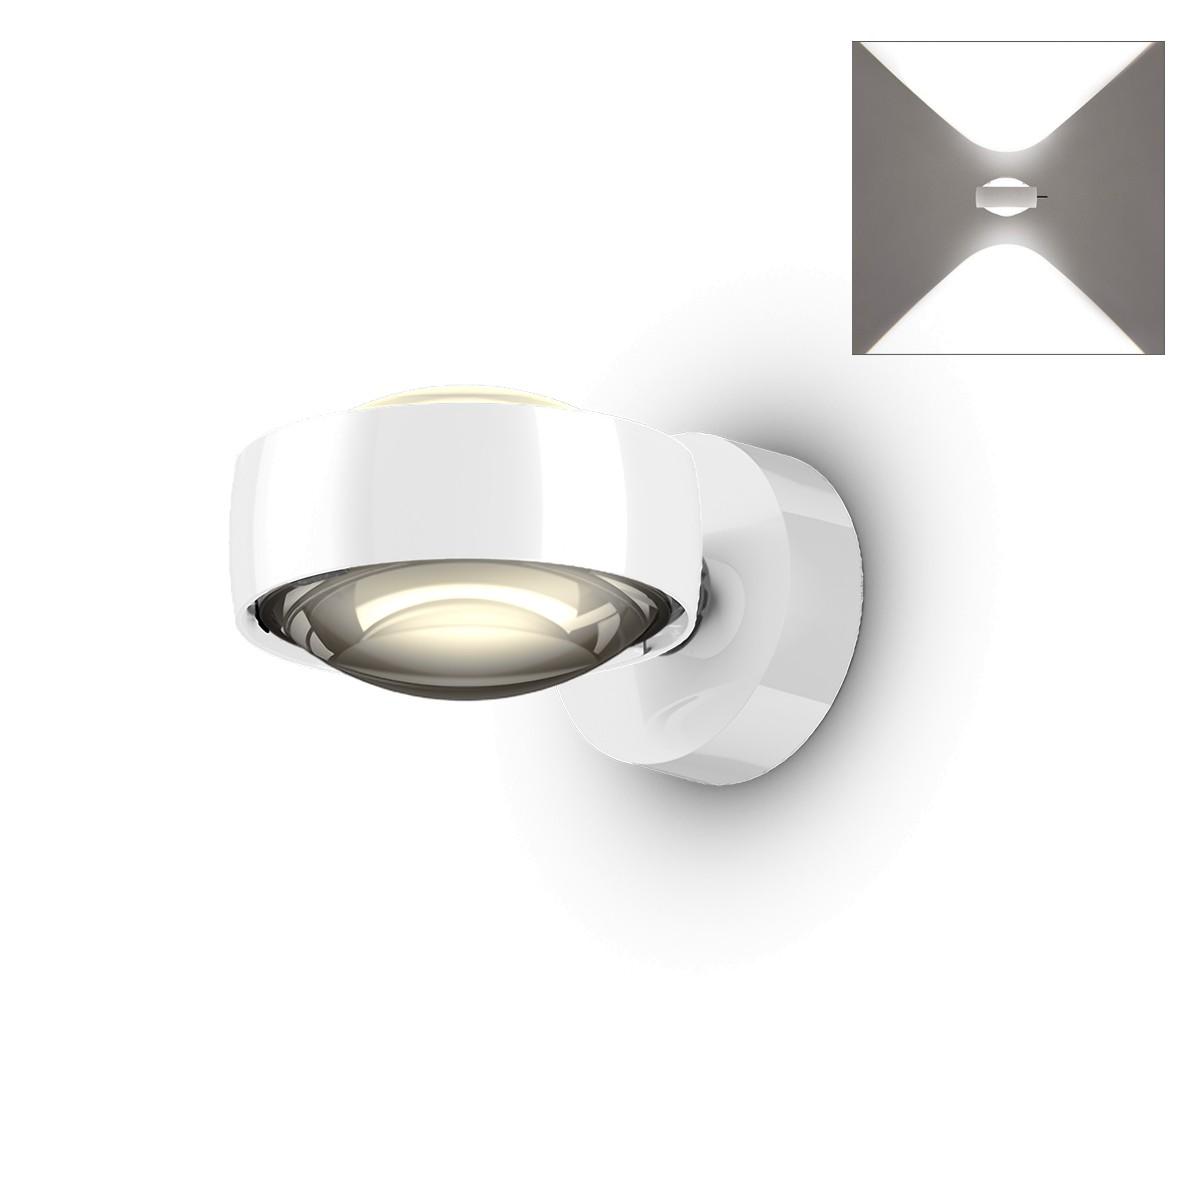 Occhio Sento D LED verticale up Wandleuchte, 18 W / 2700 K, Chrom / weiß glänzend